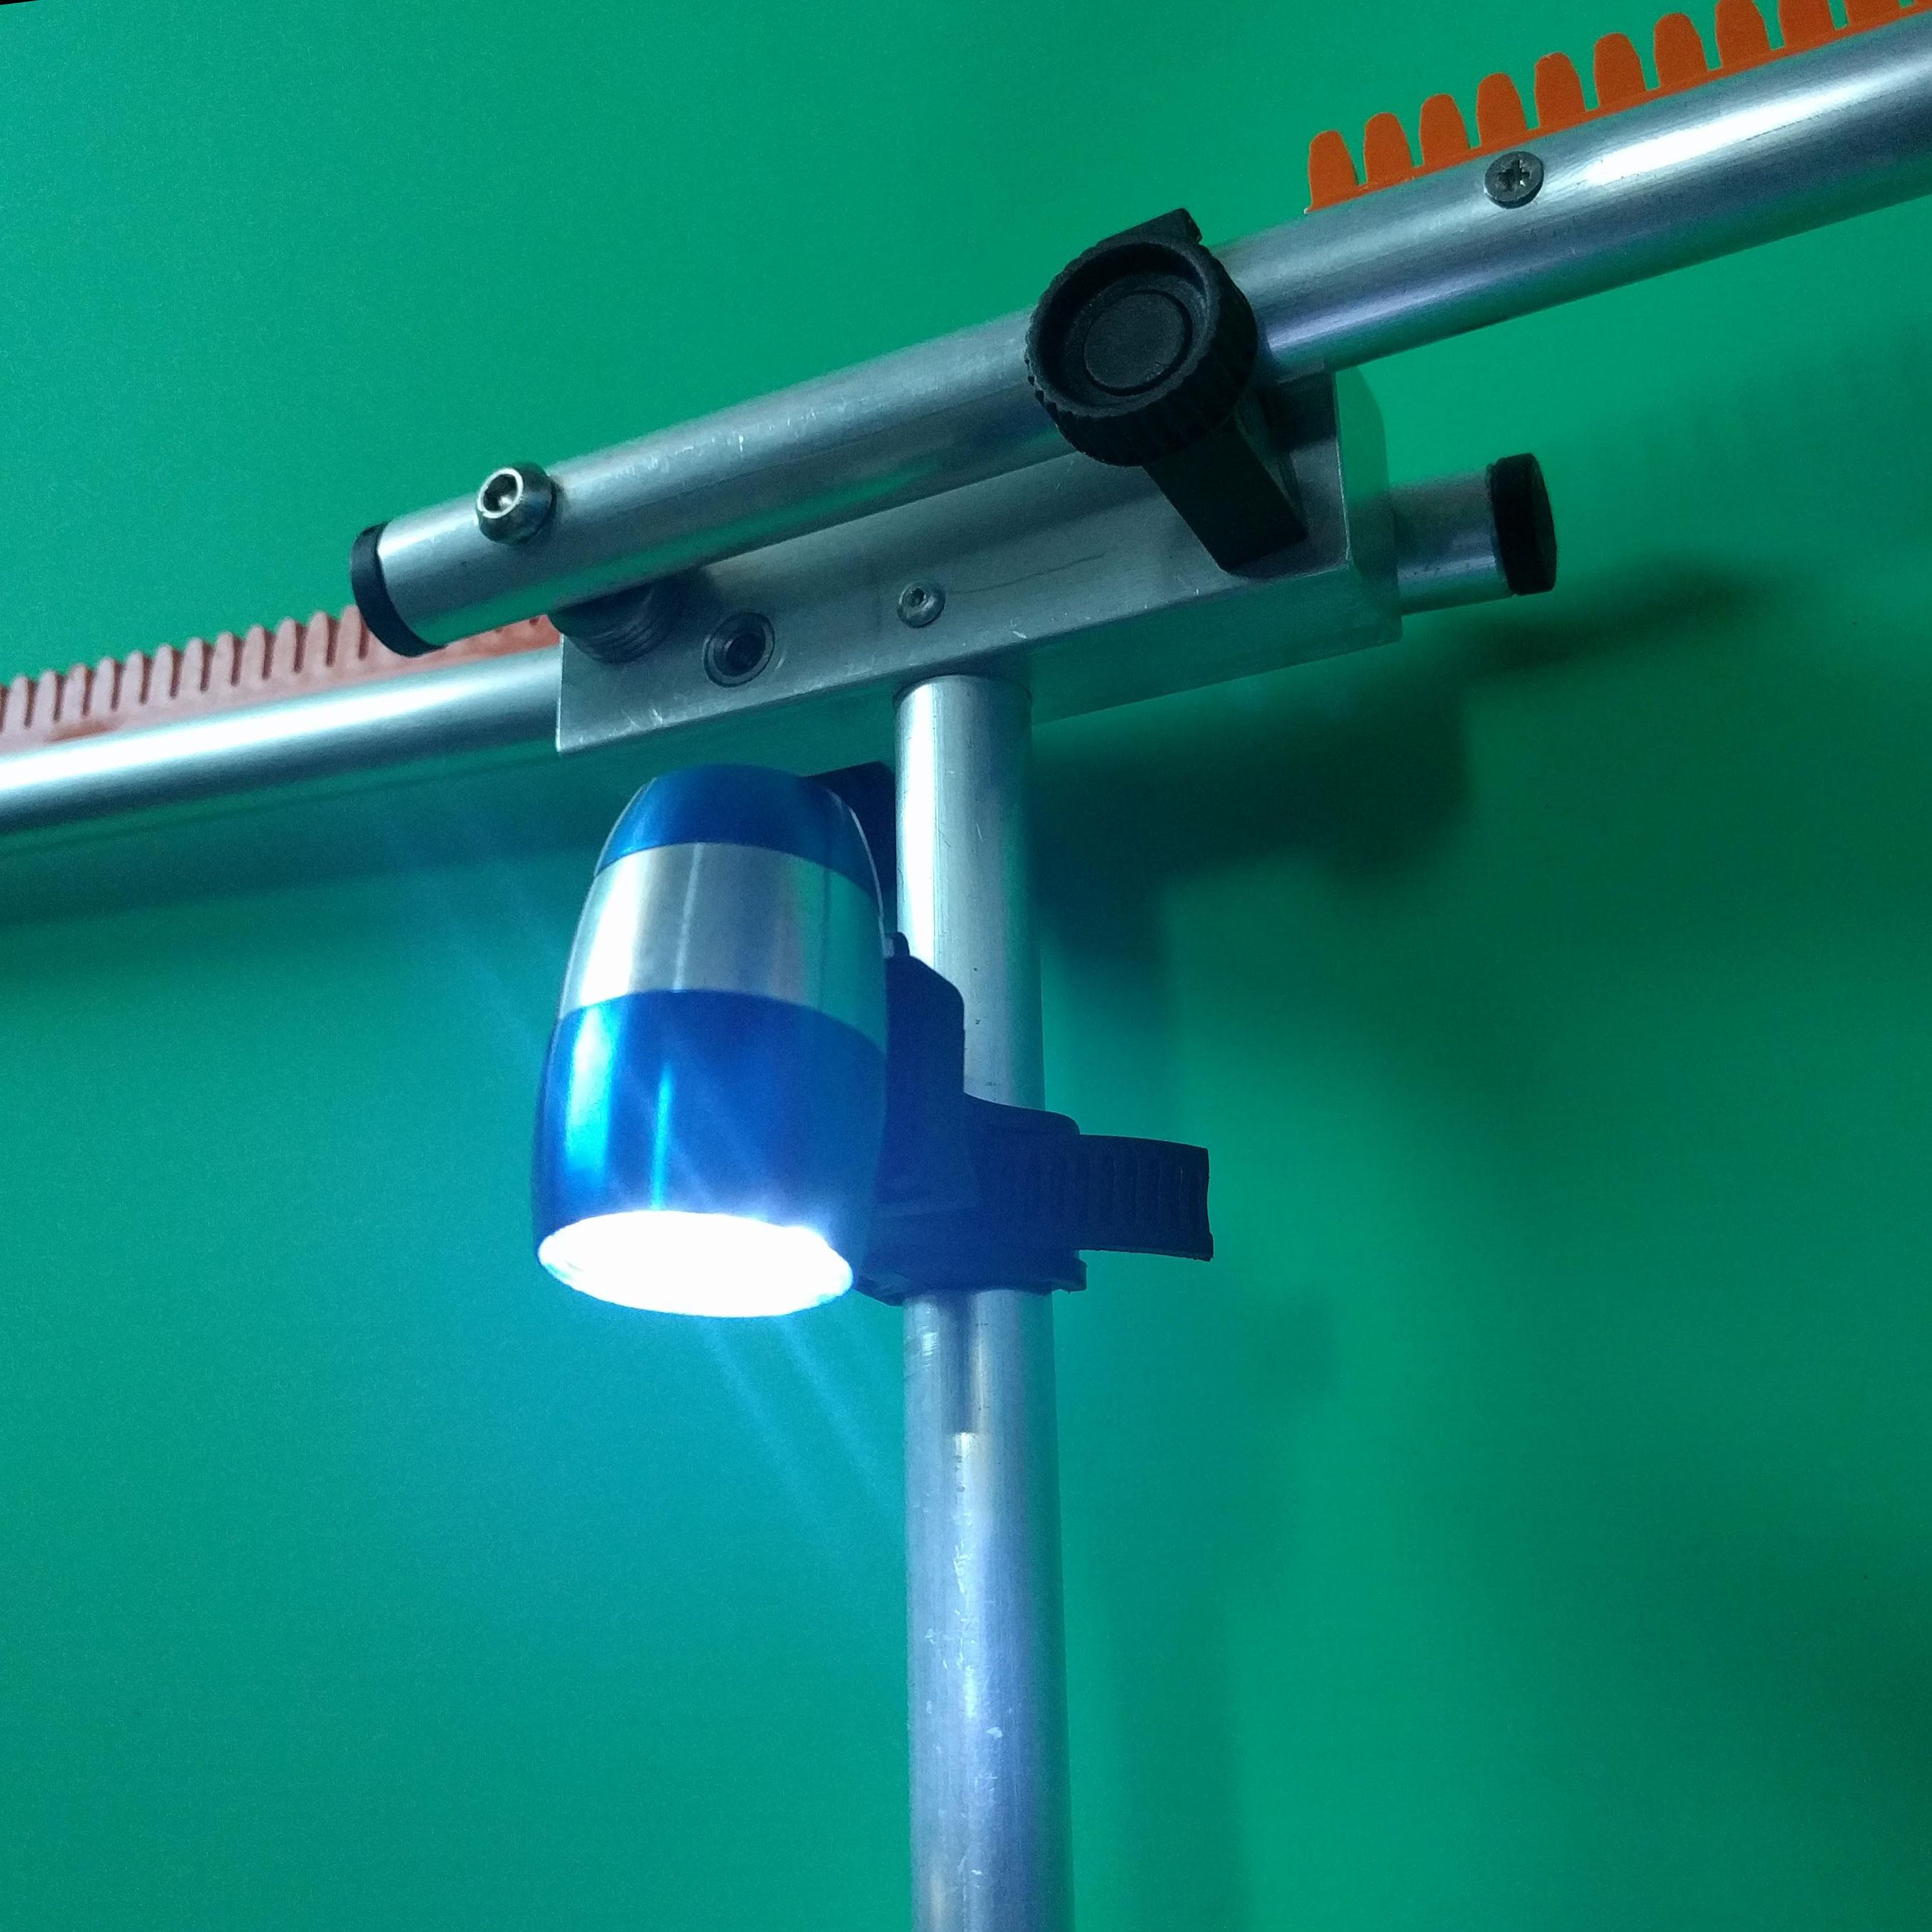 evo3pod-lampadina-led-ultra-bright-per-evo3pod_3941_4.jpg